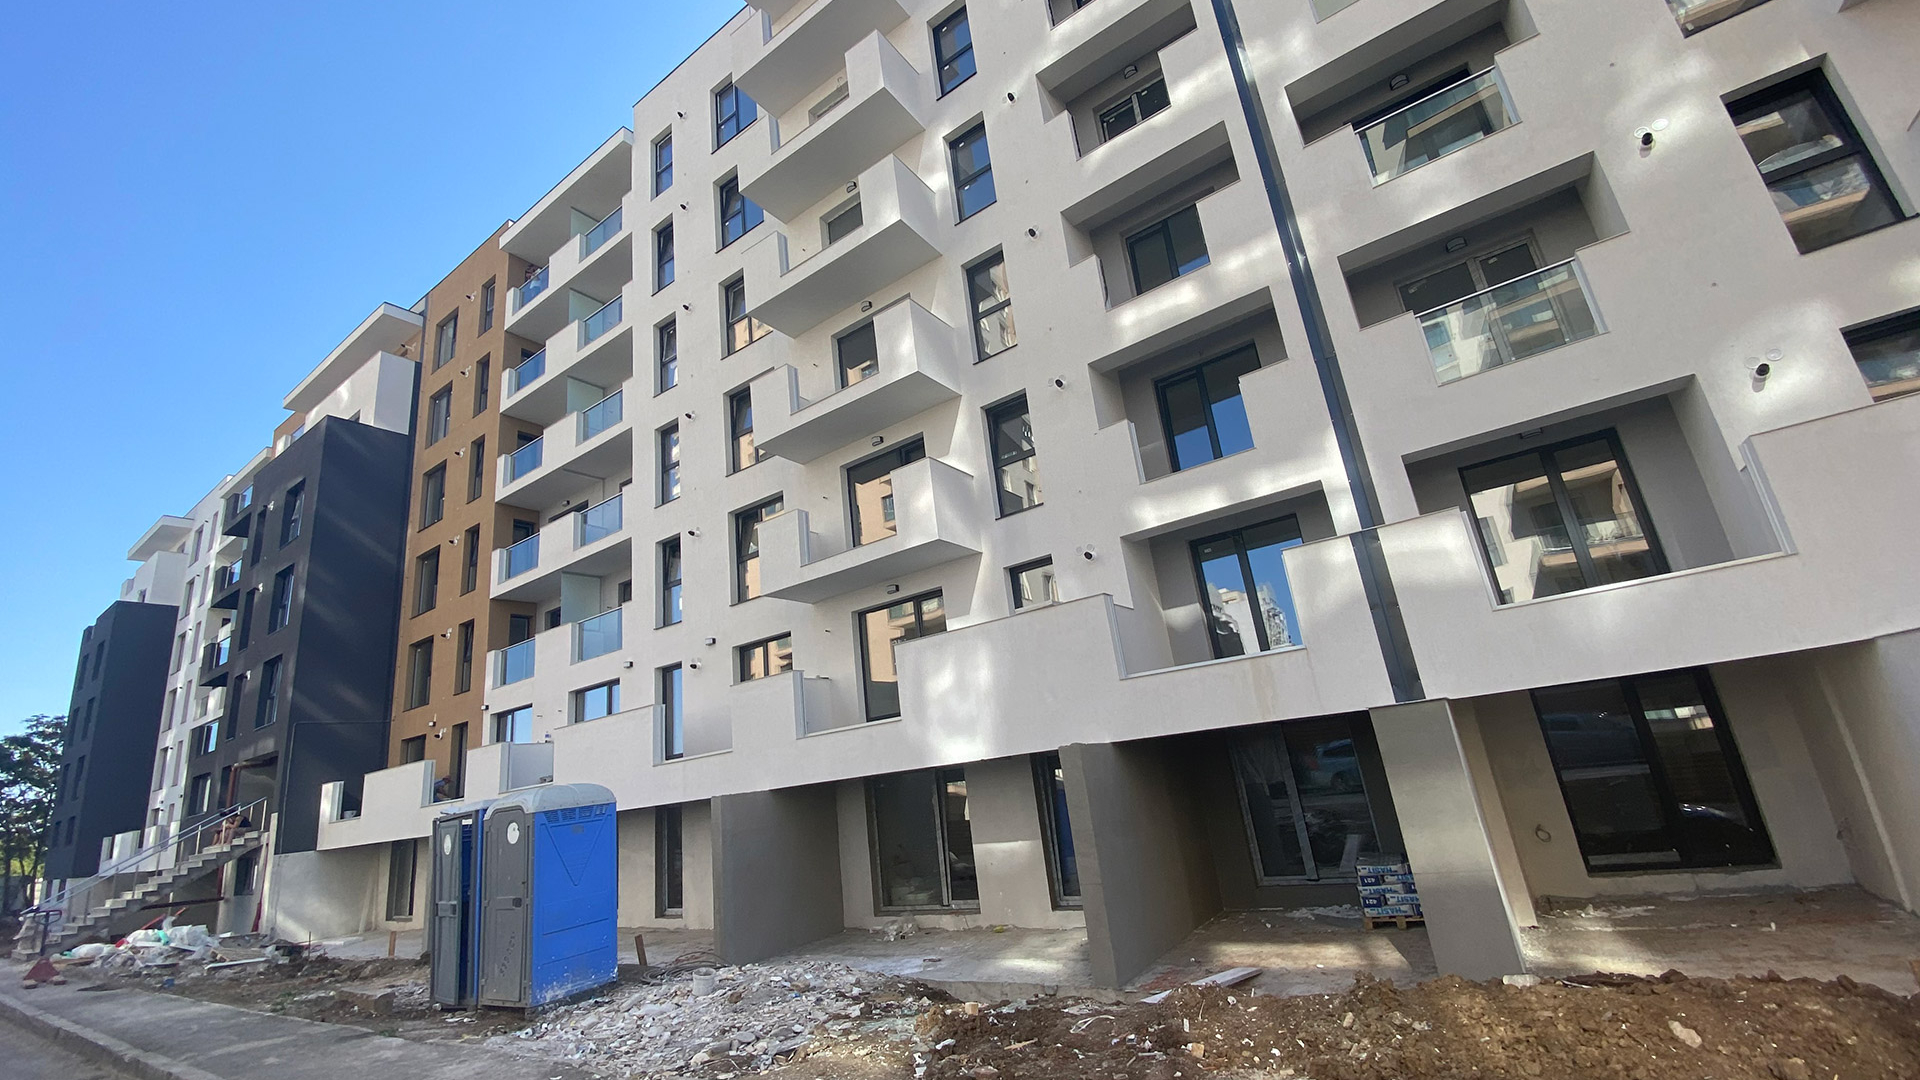 Stadiu executie Uverturii Residence 16 Septembrie 2020 - Apartamente si garsoniere de vanzare Militari, Gorjului - 6